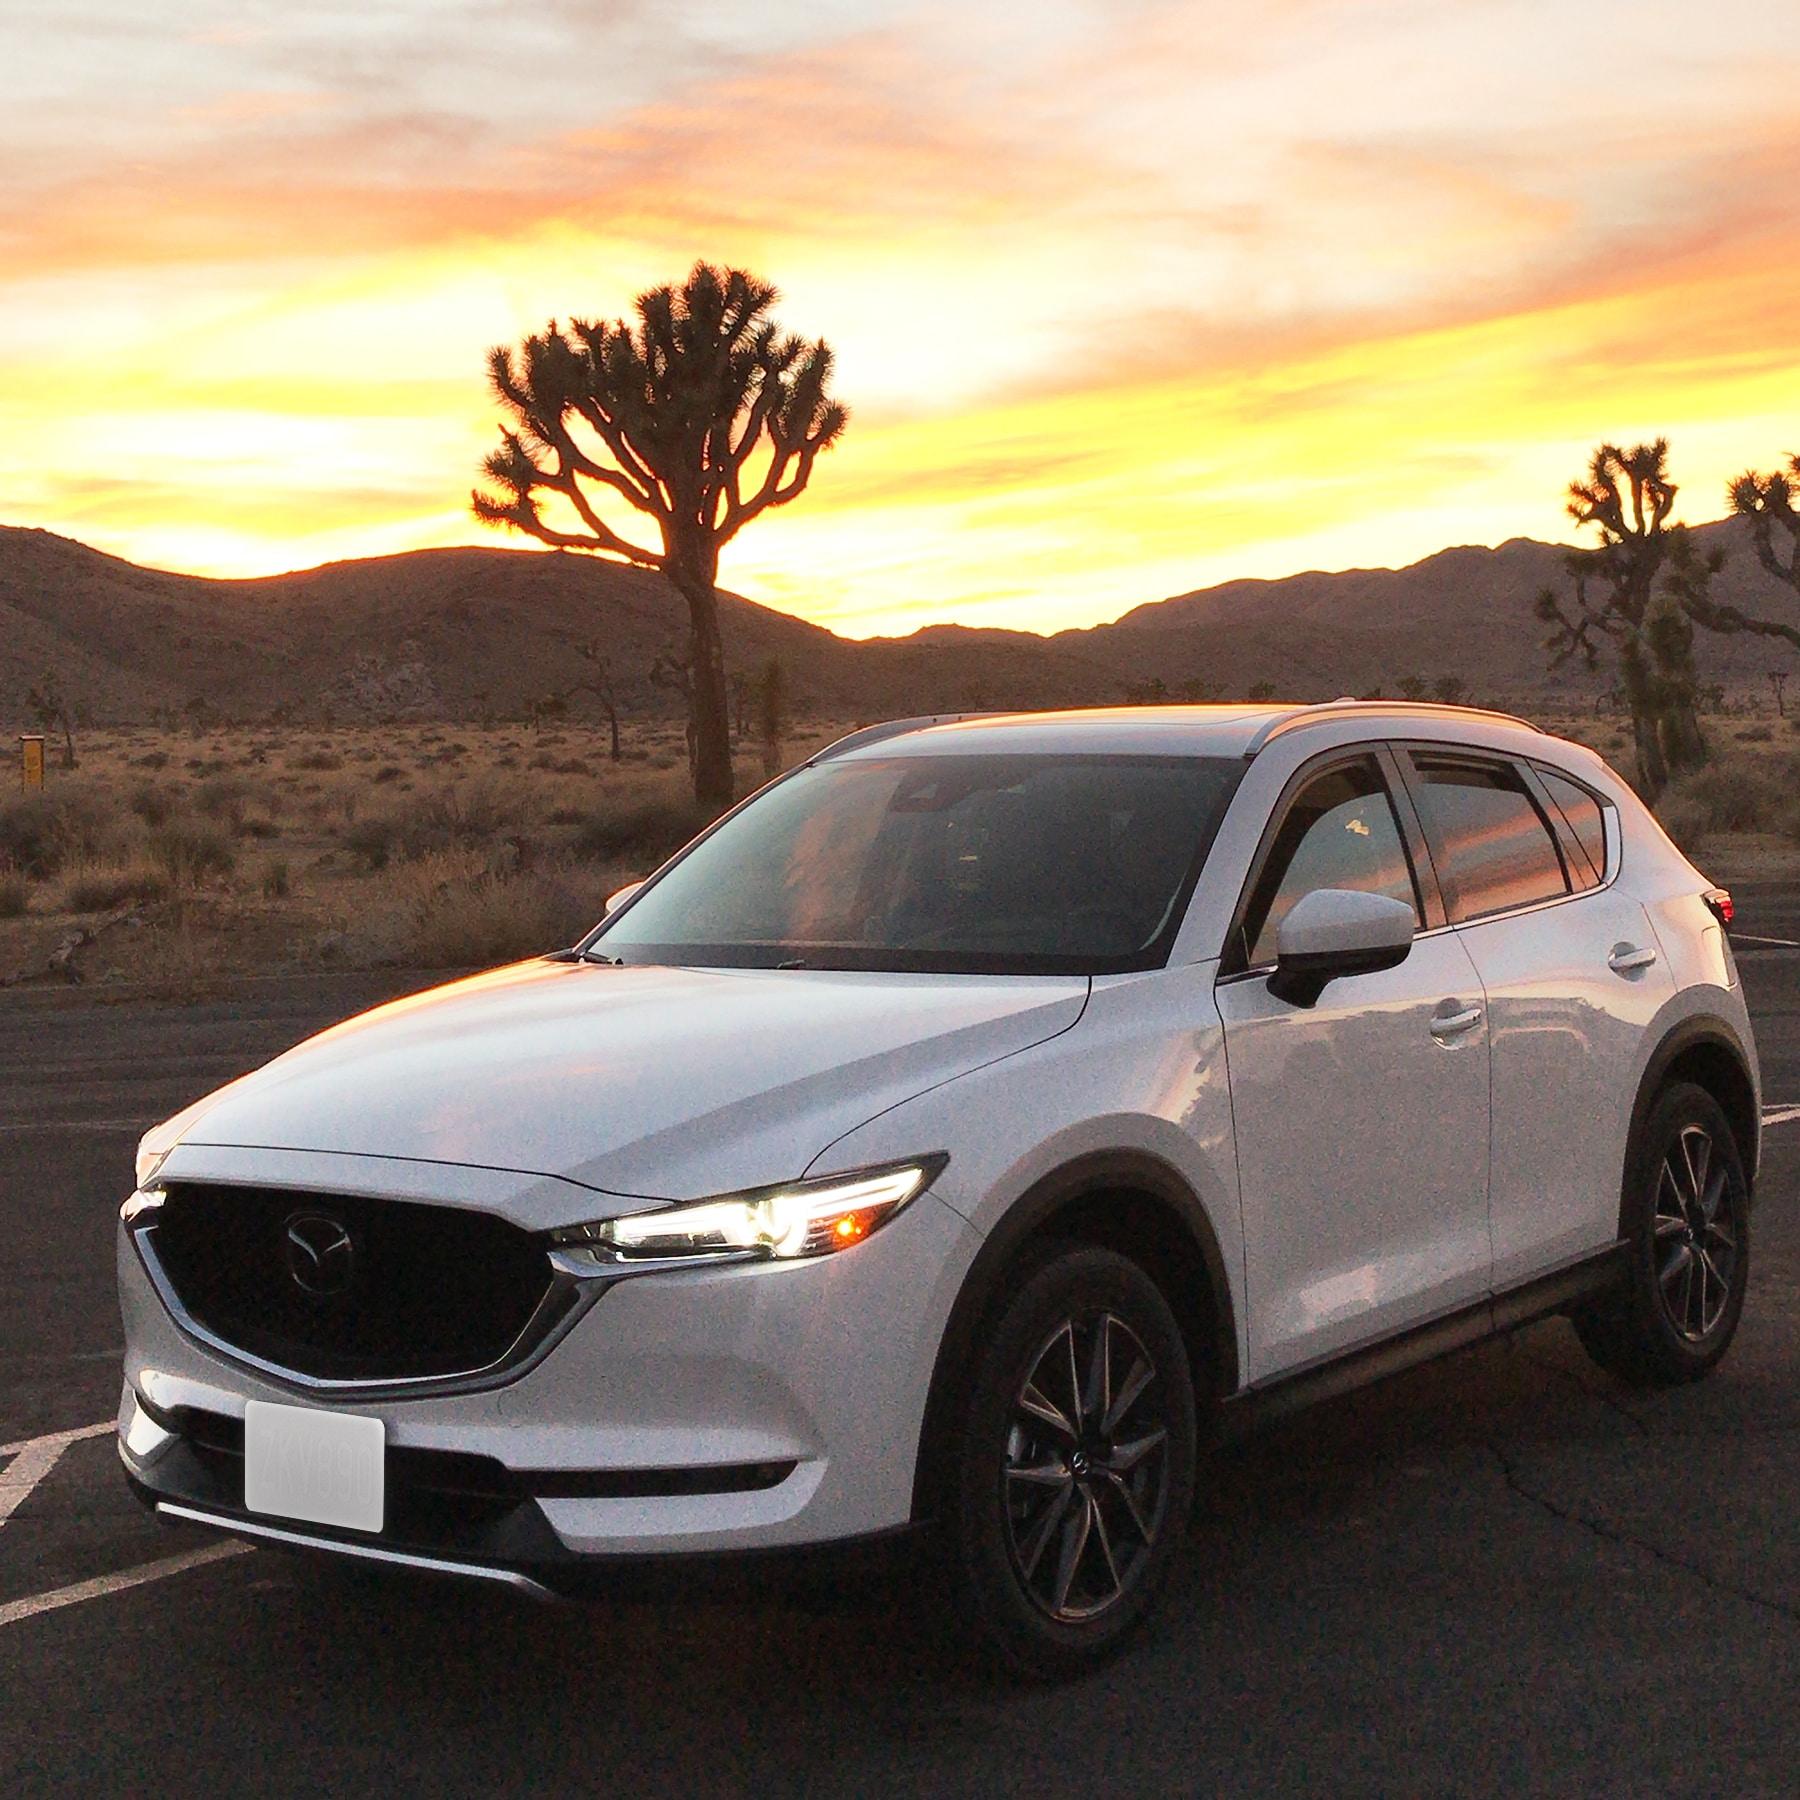 Mazda Lease Deals >> Mazda Cx 5 Lease Deals Easton Pa Ray Price Mazda